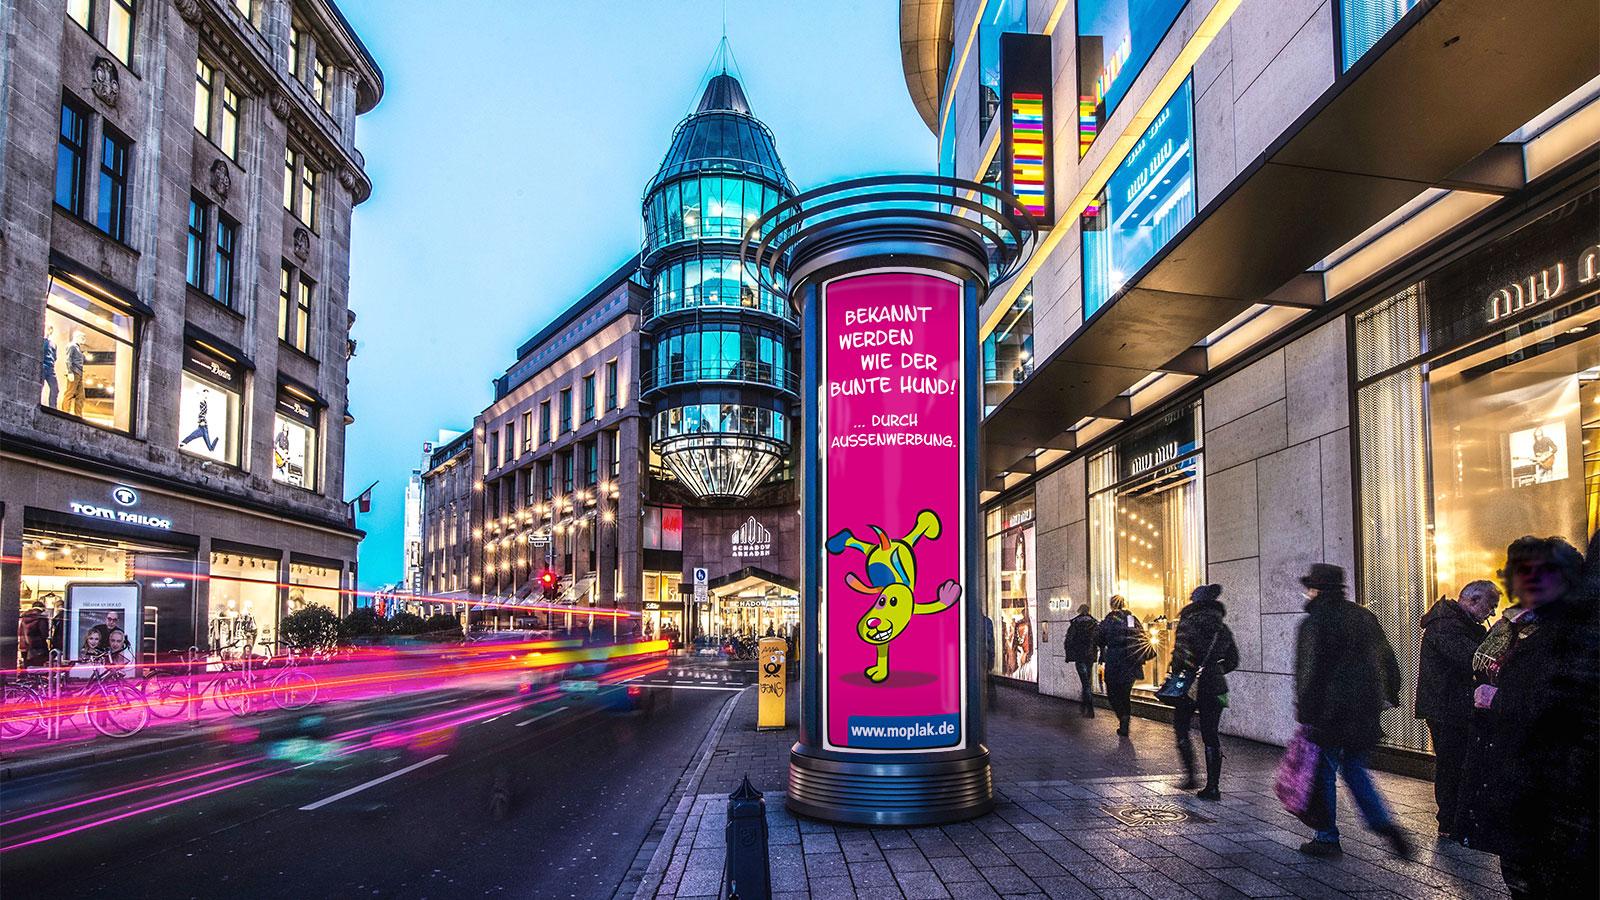 Chemnitz-Aussenwerbung-Litfasssaeule-Werbung